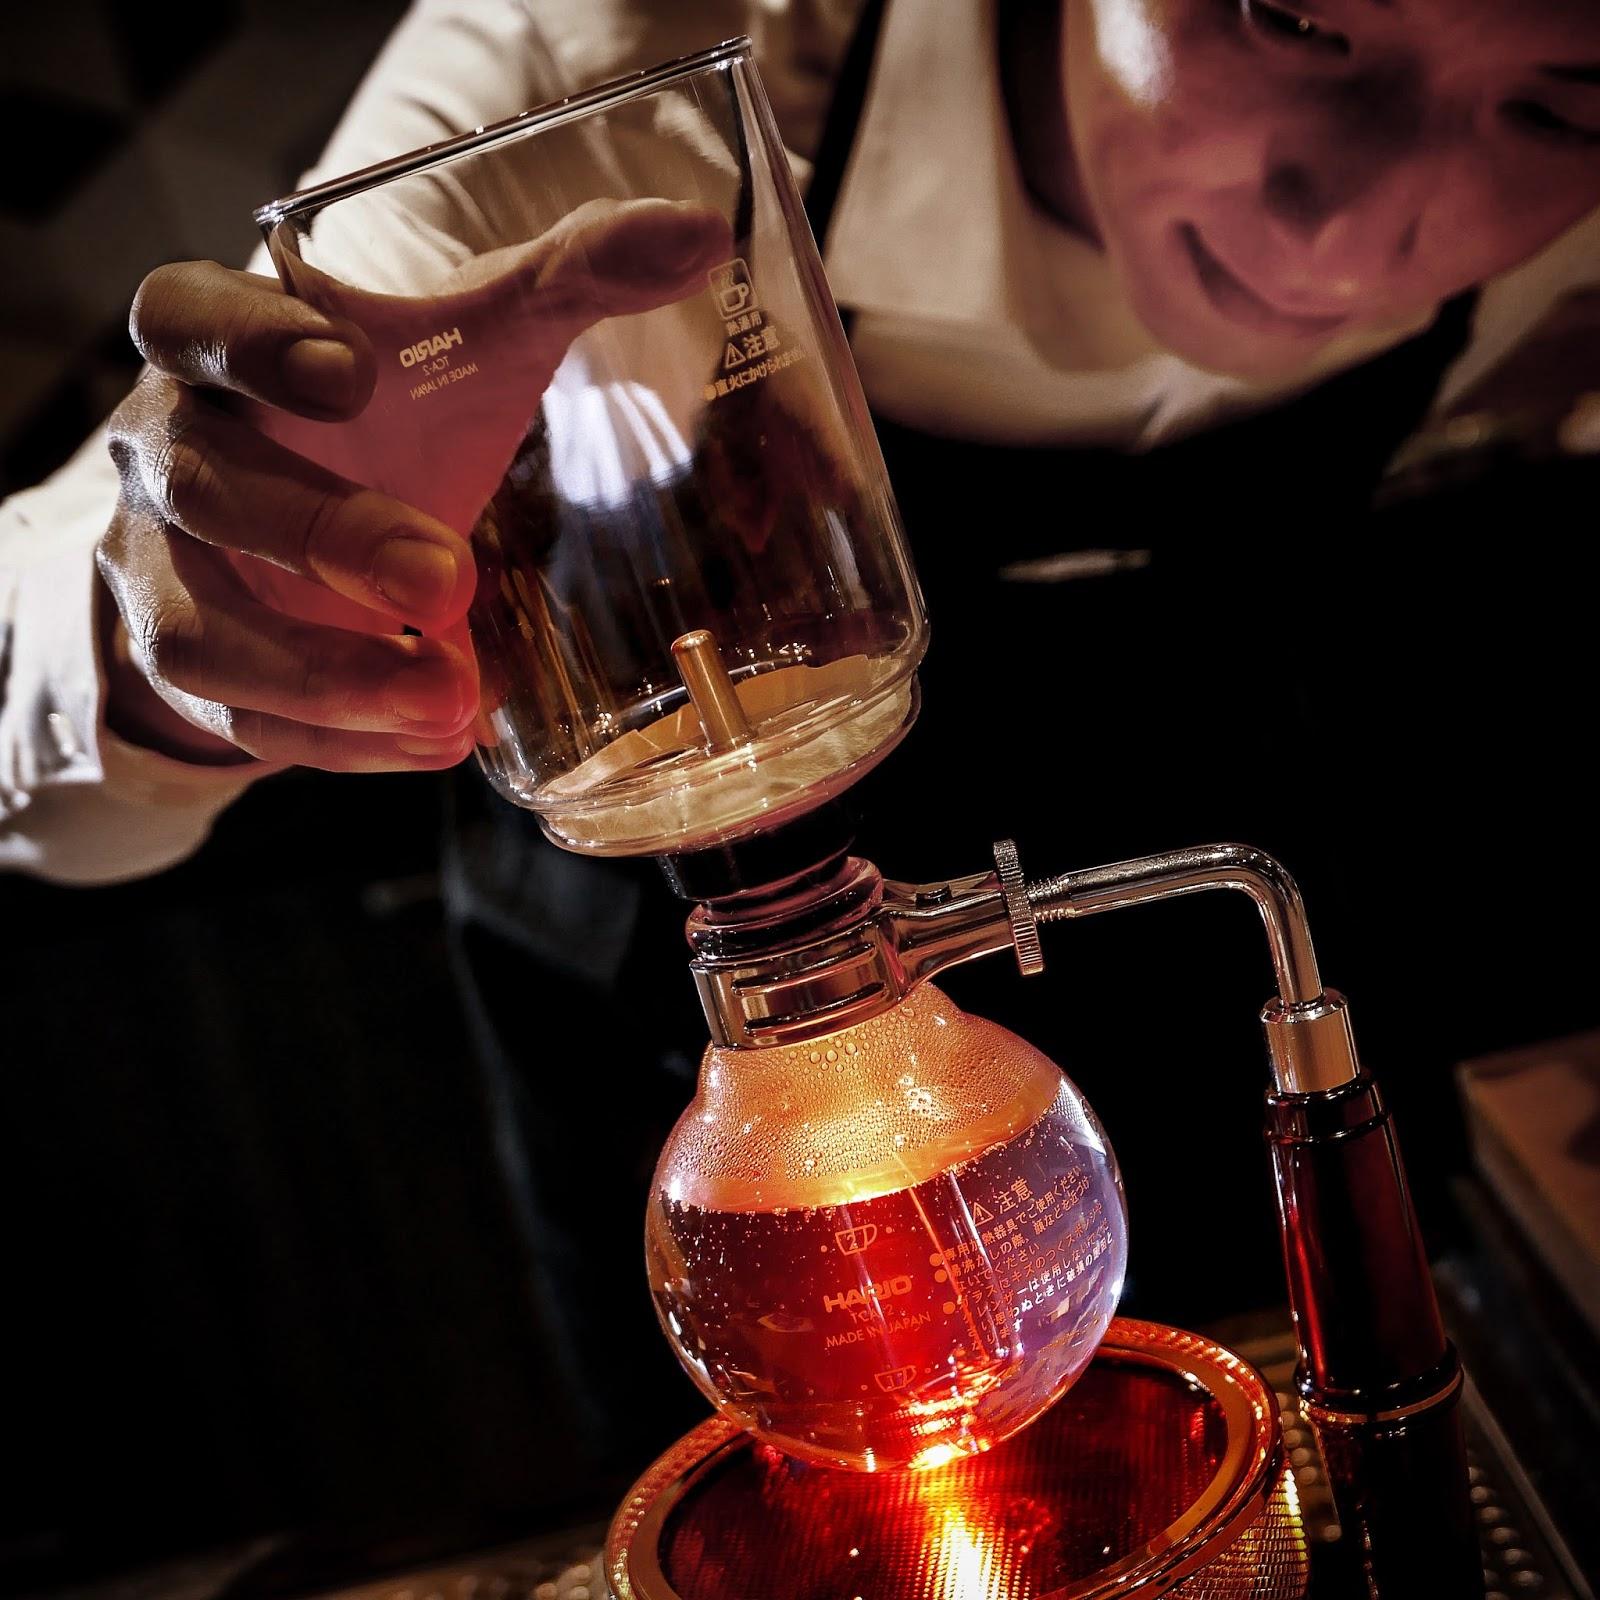 Starbucks Coffee Siphon brewing method